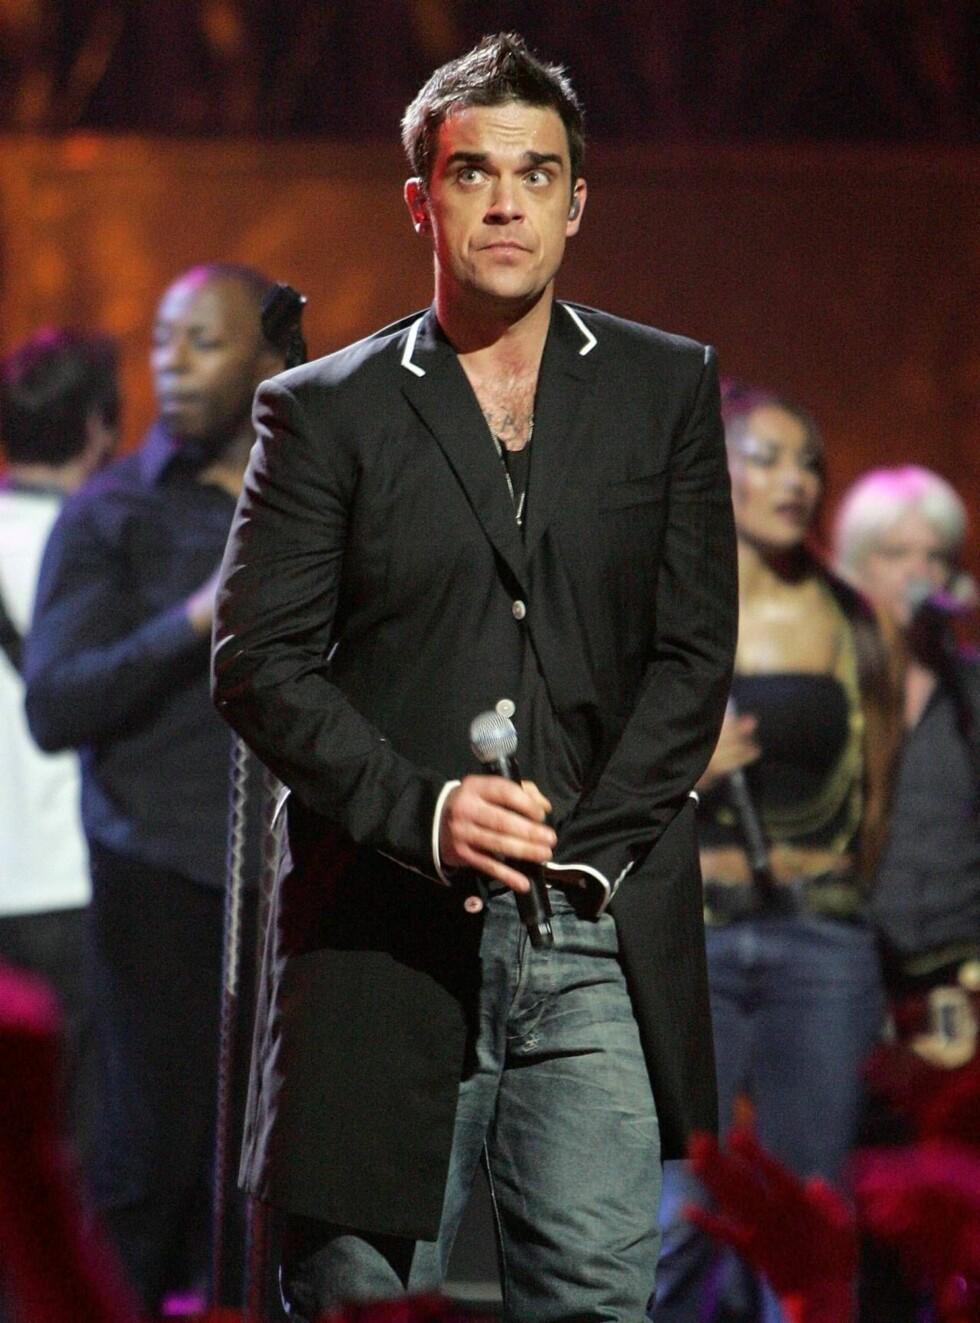 BABYNEKT: Robbie Williams har verken planer om karriere eller familie i fremtiden. Foto: All Over Press